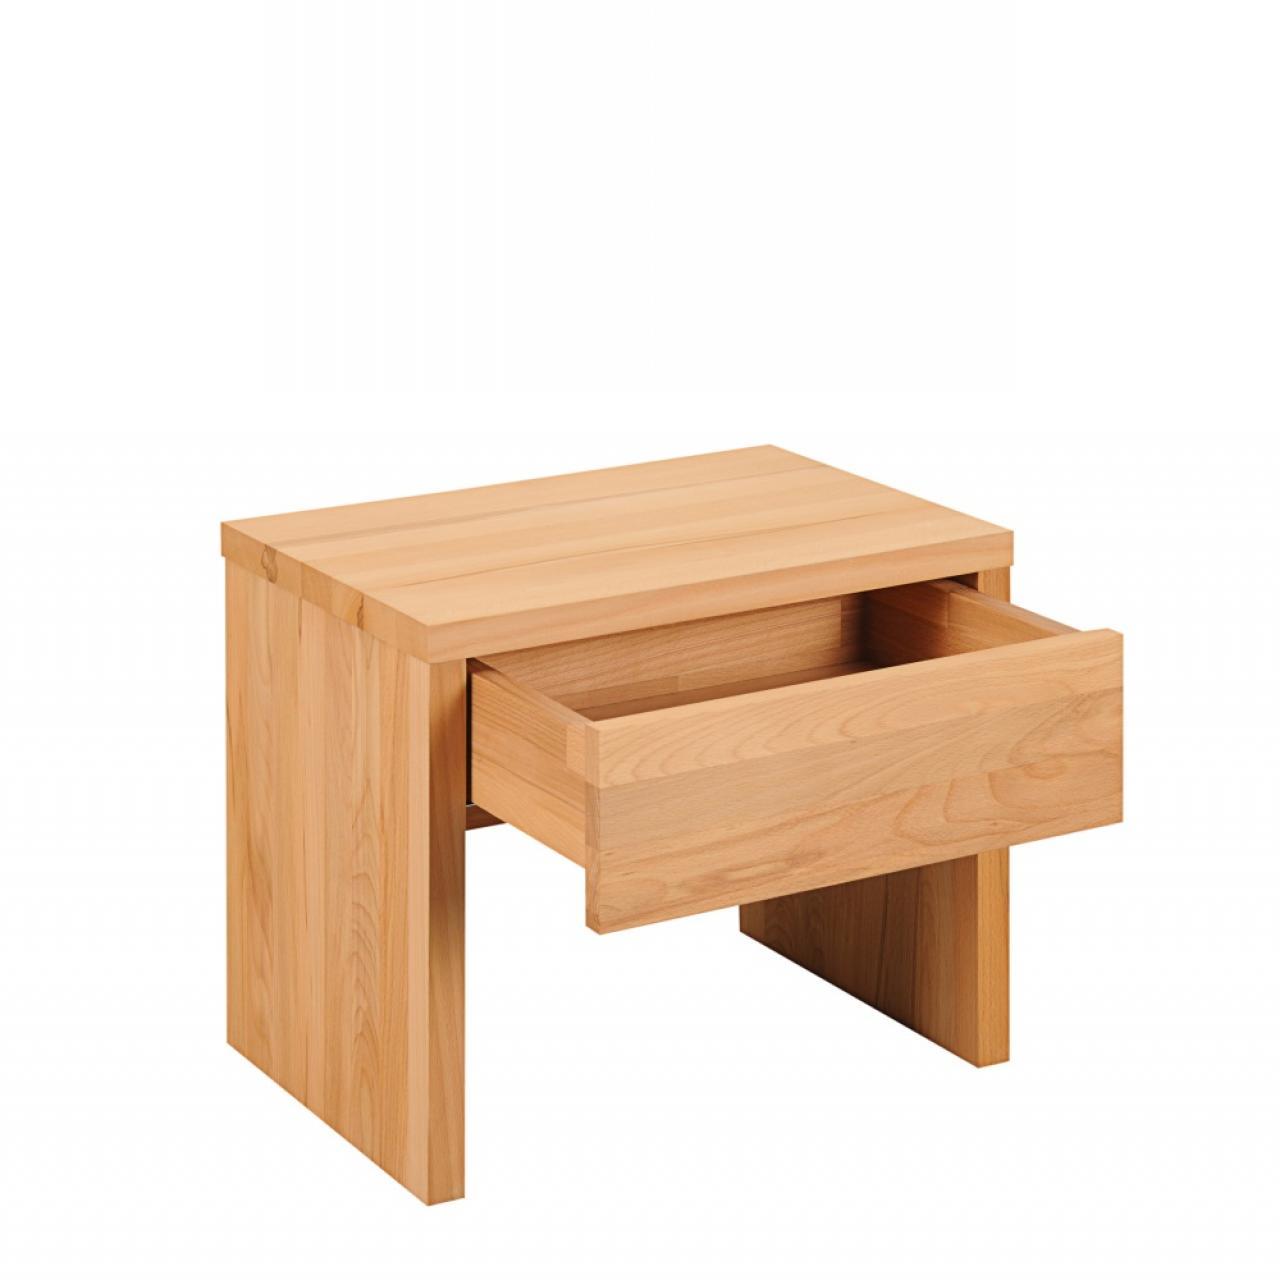 nachtkonsole wildbuche massivholz 1 schubkasten. Black Bedroom Furniture Sets. Home Design Ideas